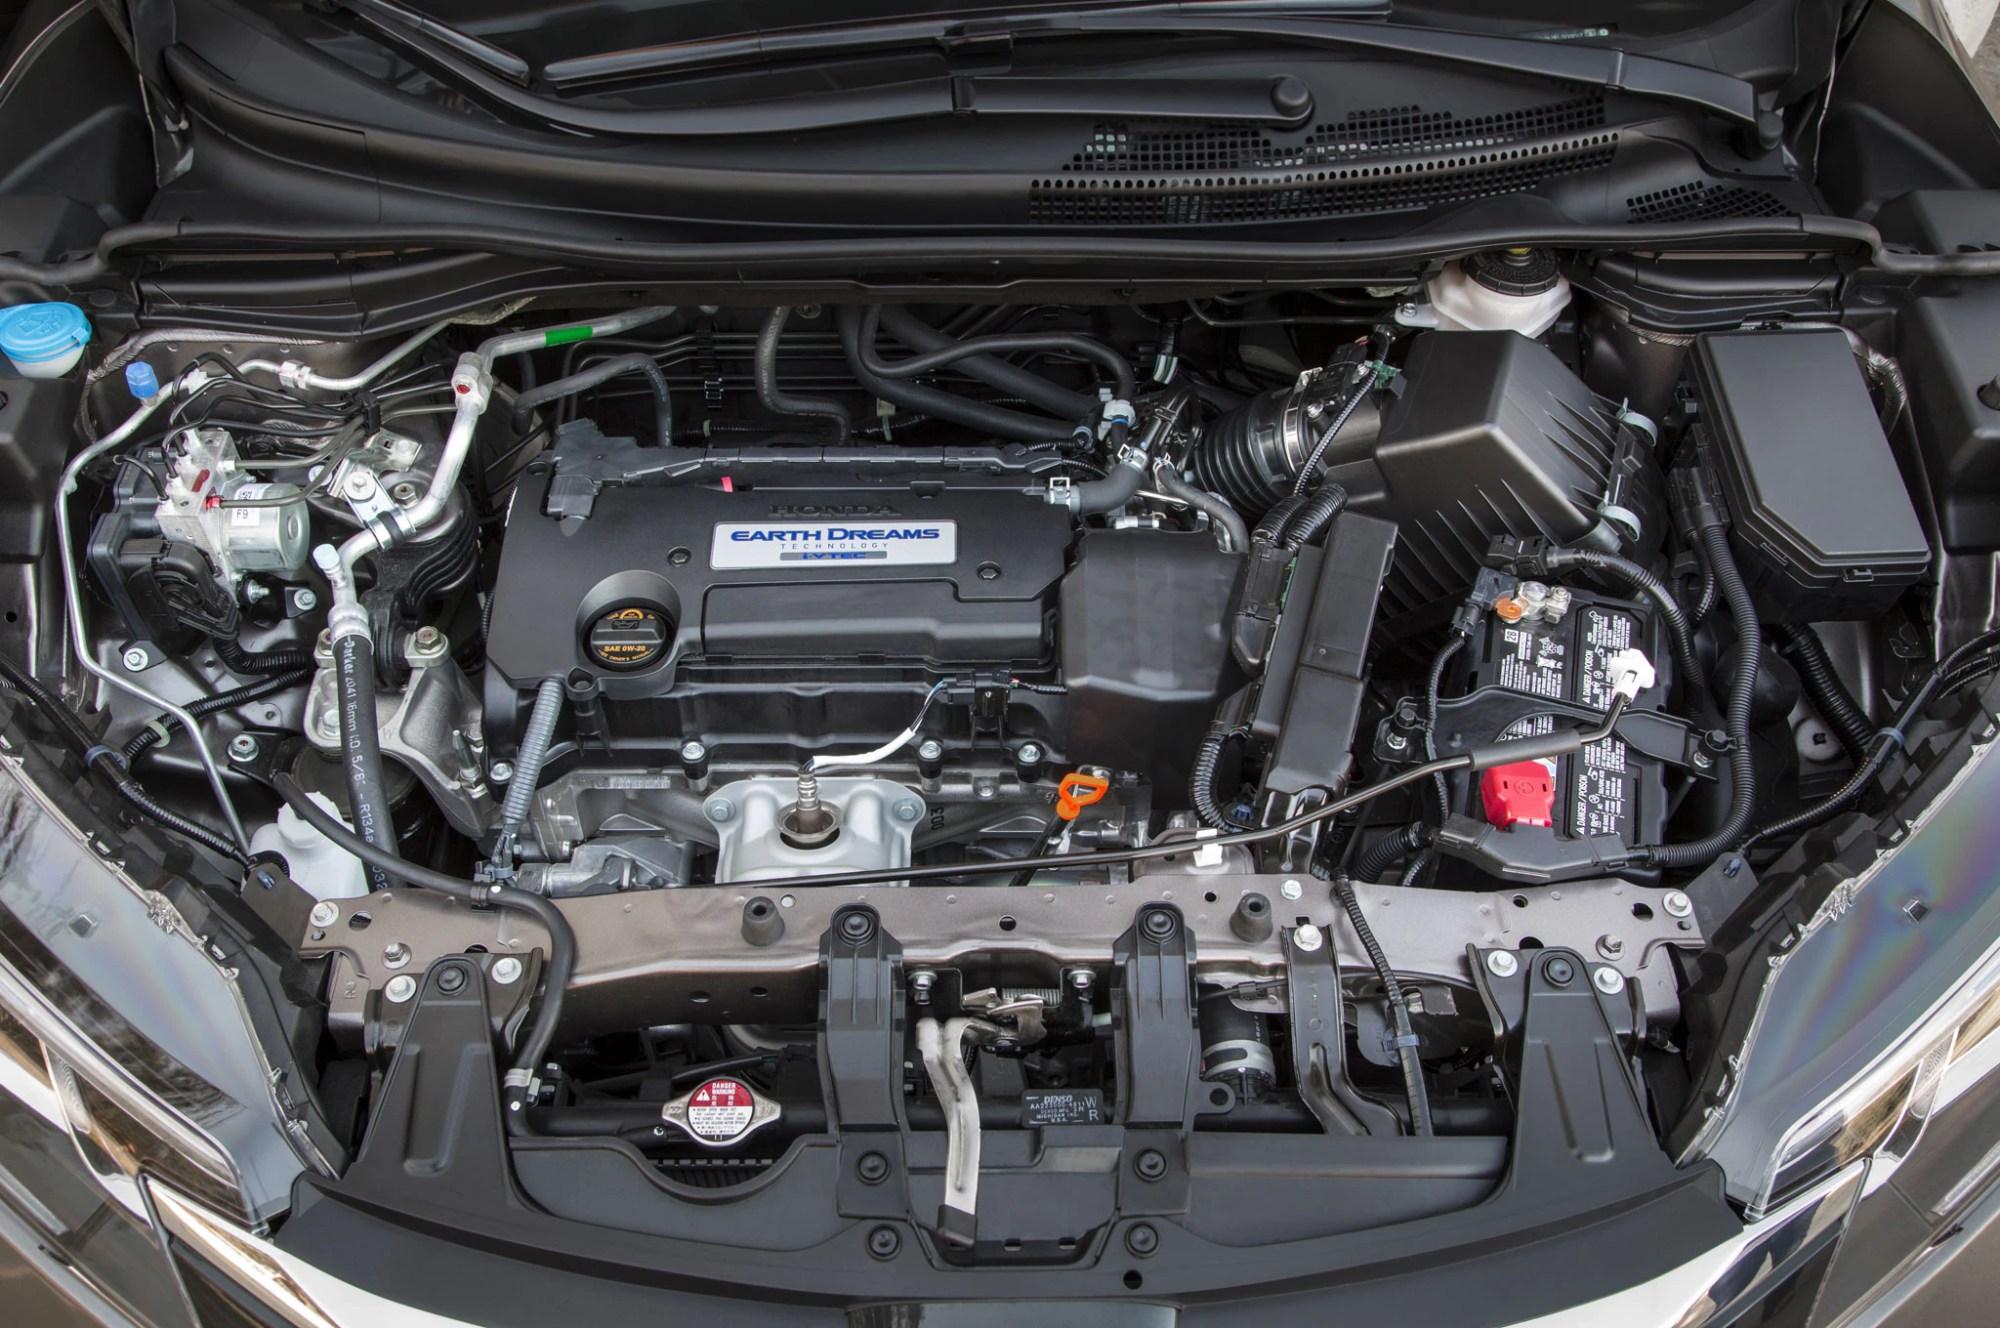 hight resolution of 97 honda cr v engine bay diagram wiring library 2015 honda cr v engine 2